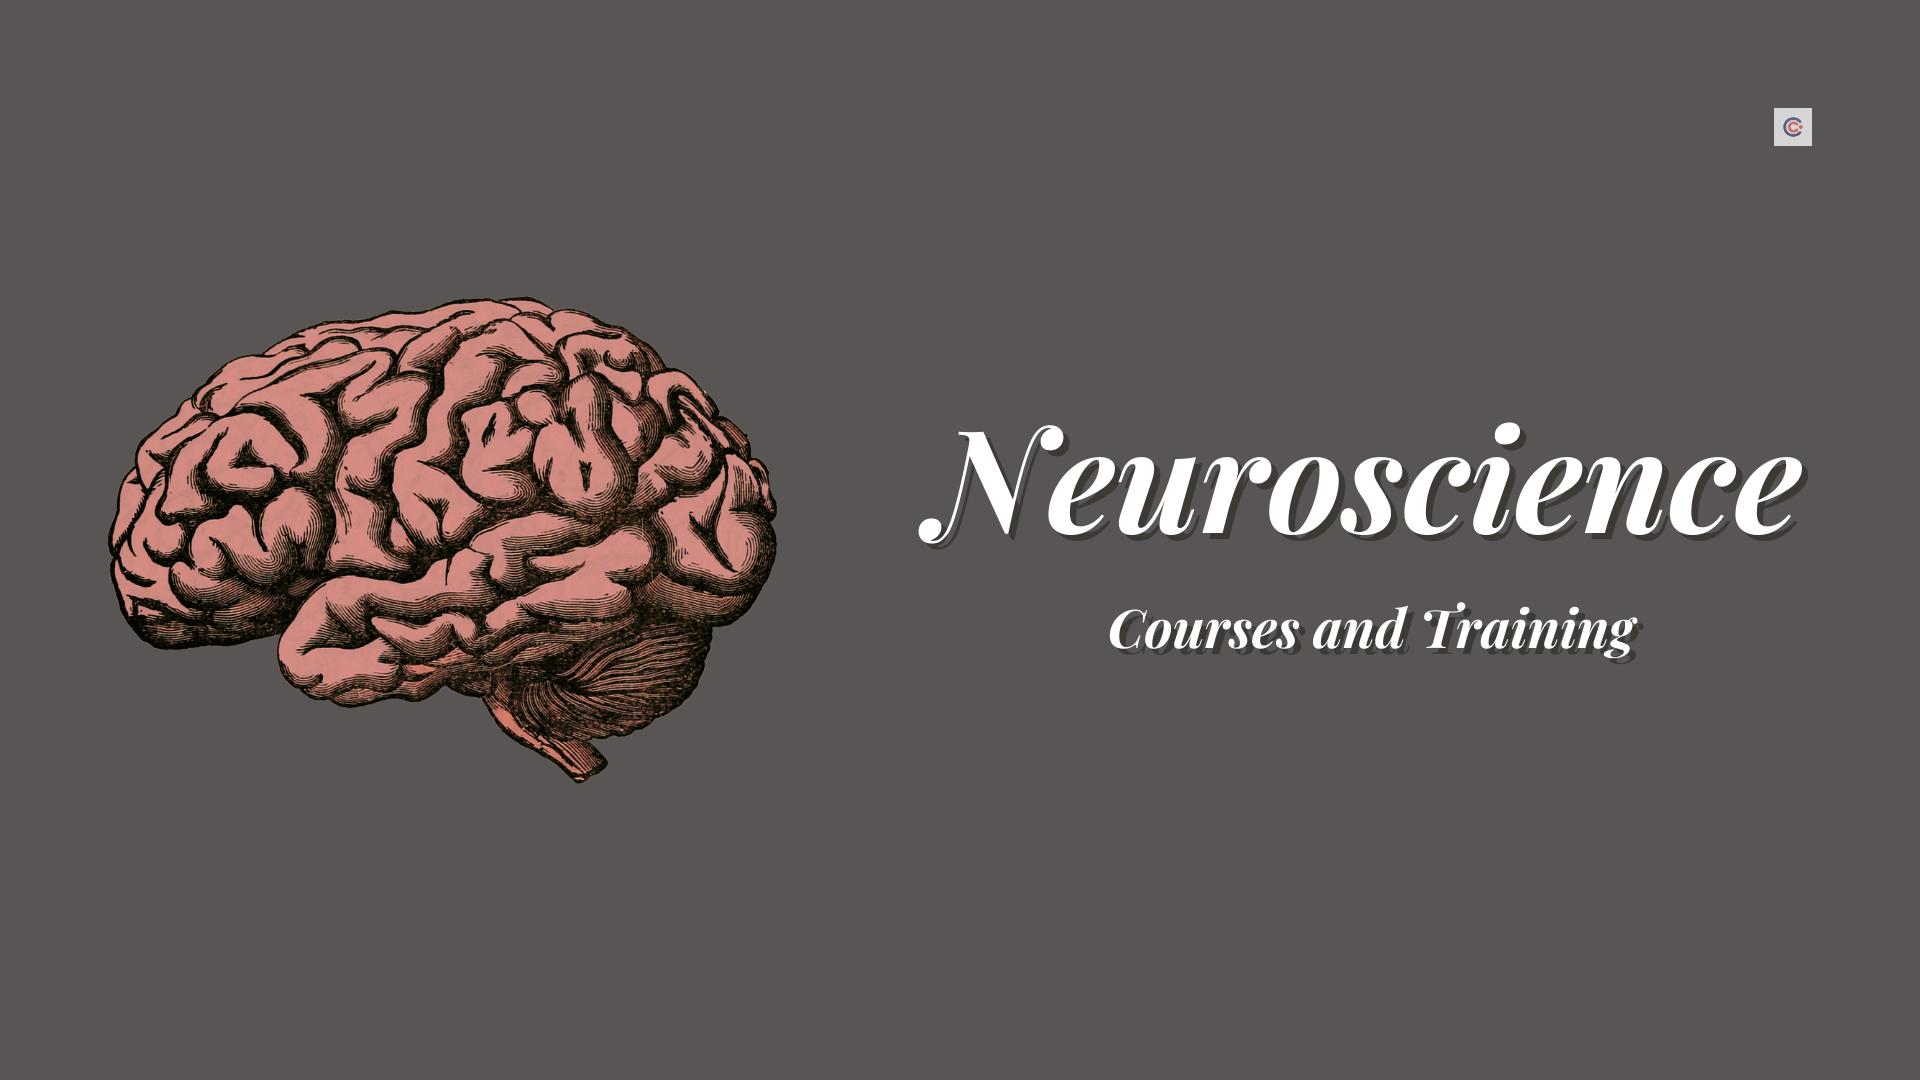 11 Best Neuroscience Courses and Training - Learn Neuroscience Online